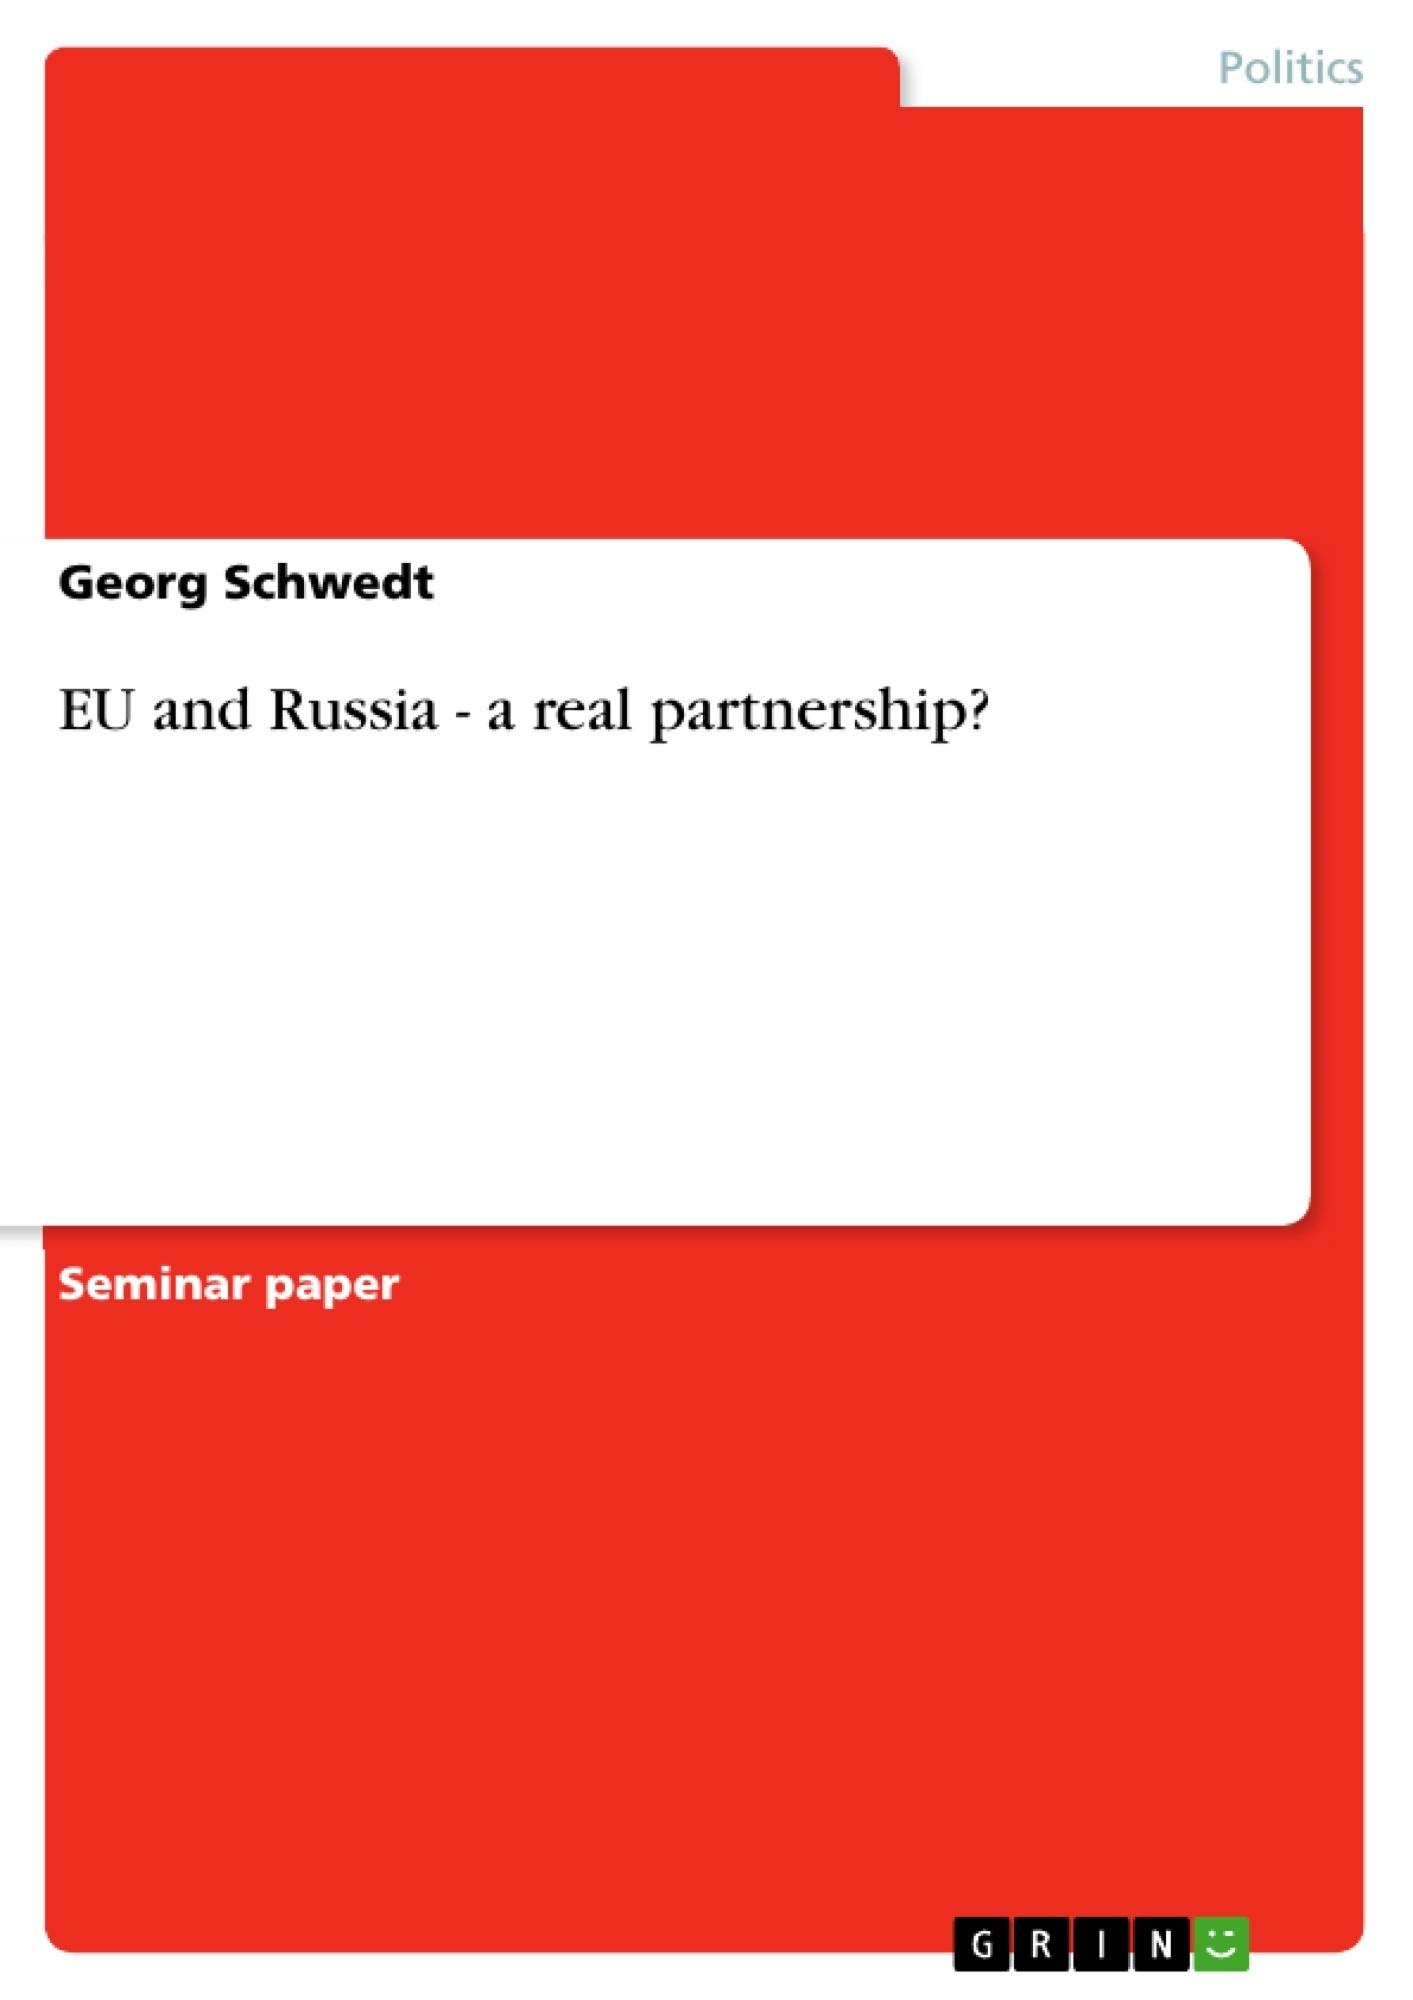 Title: EU and Russia - a real partnership?